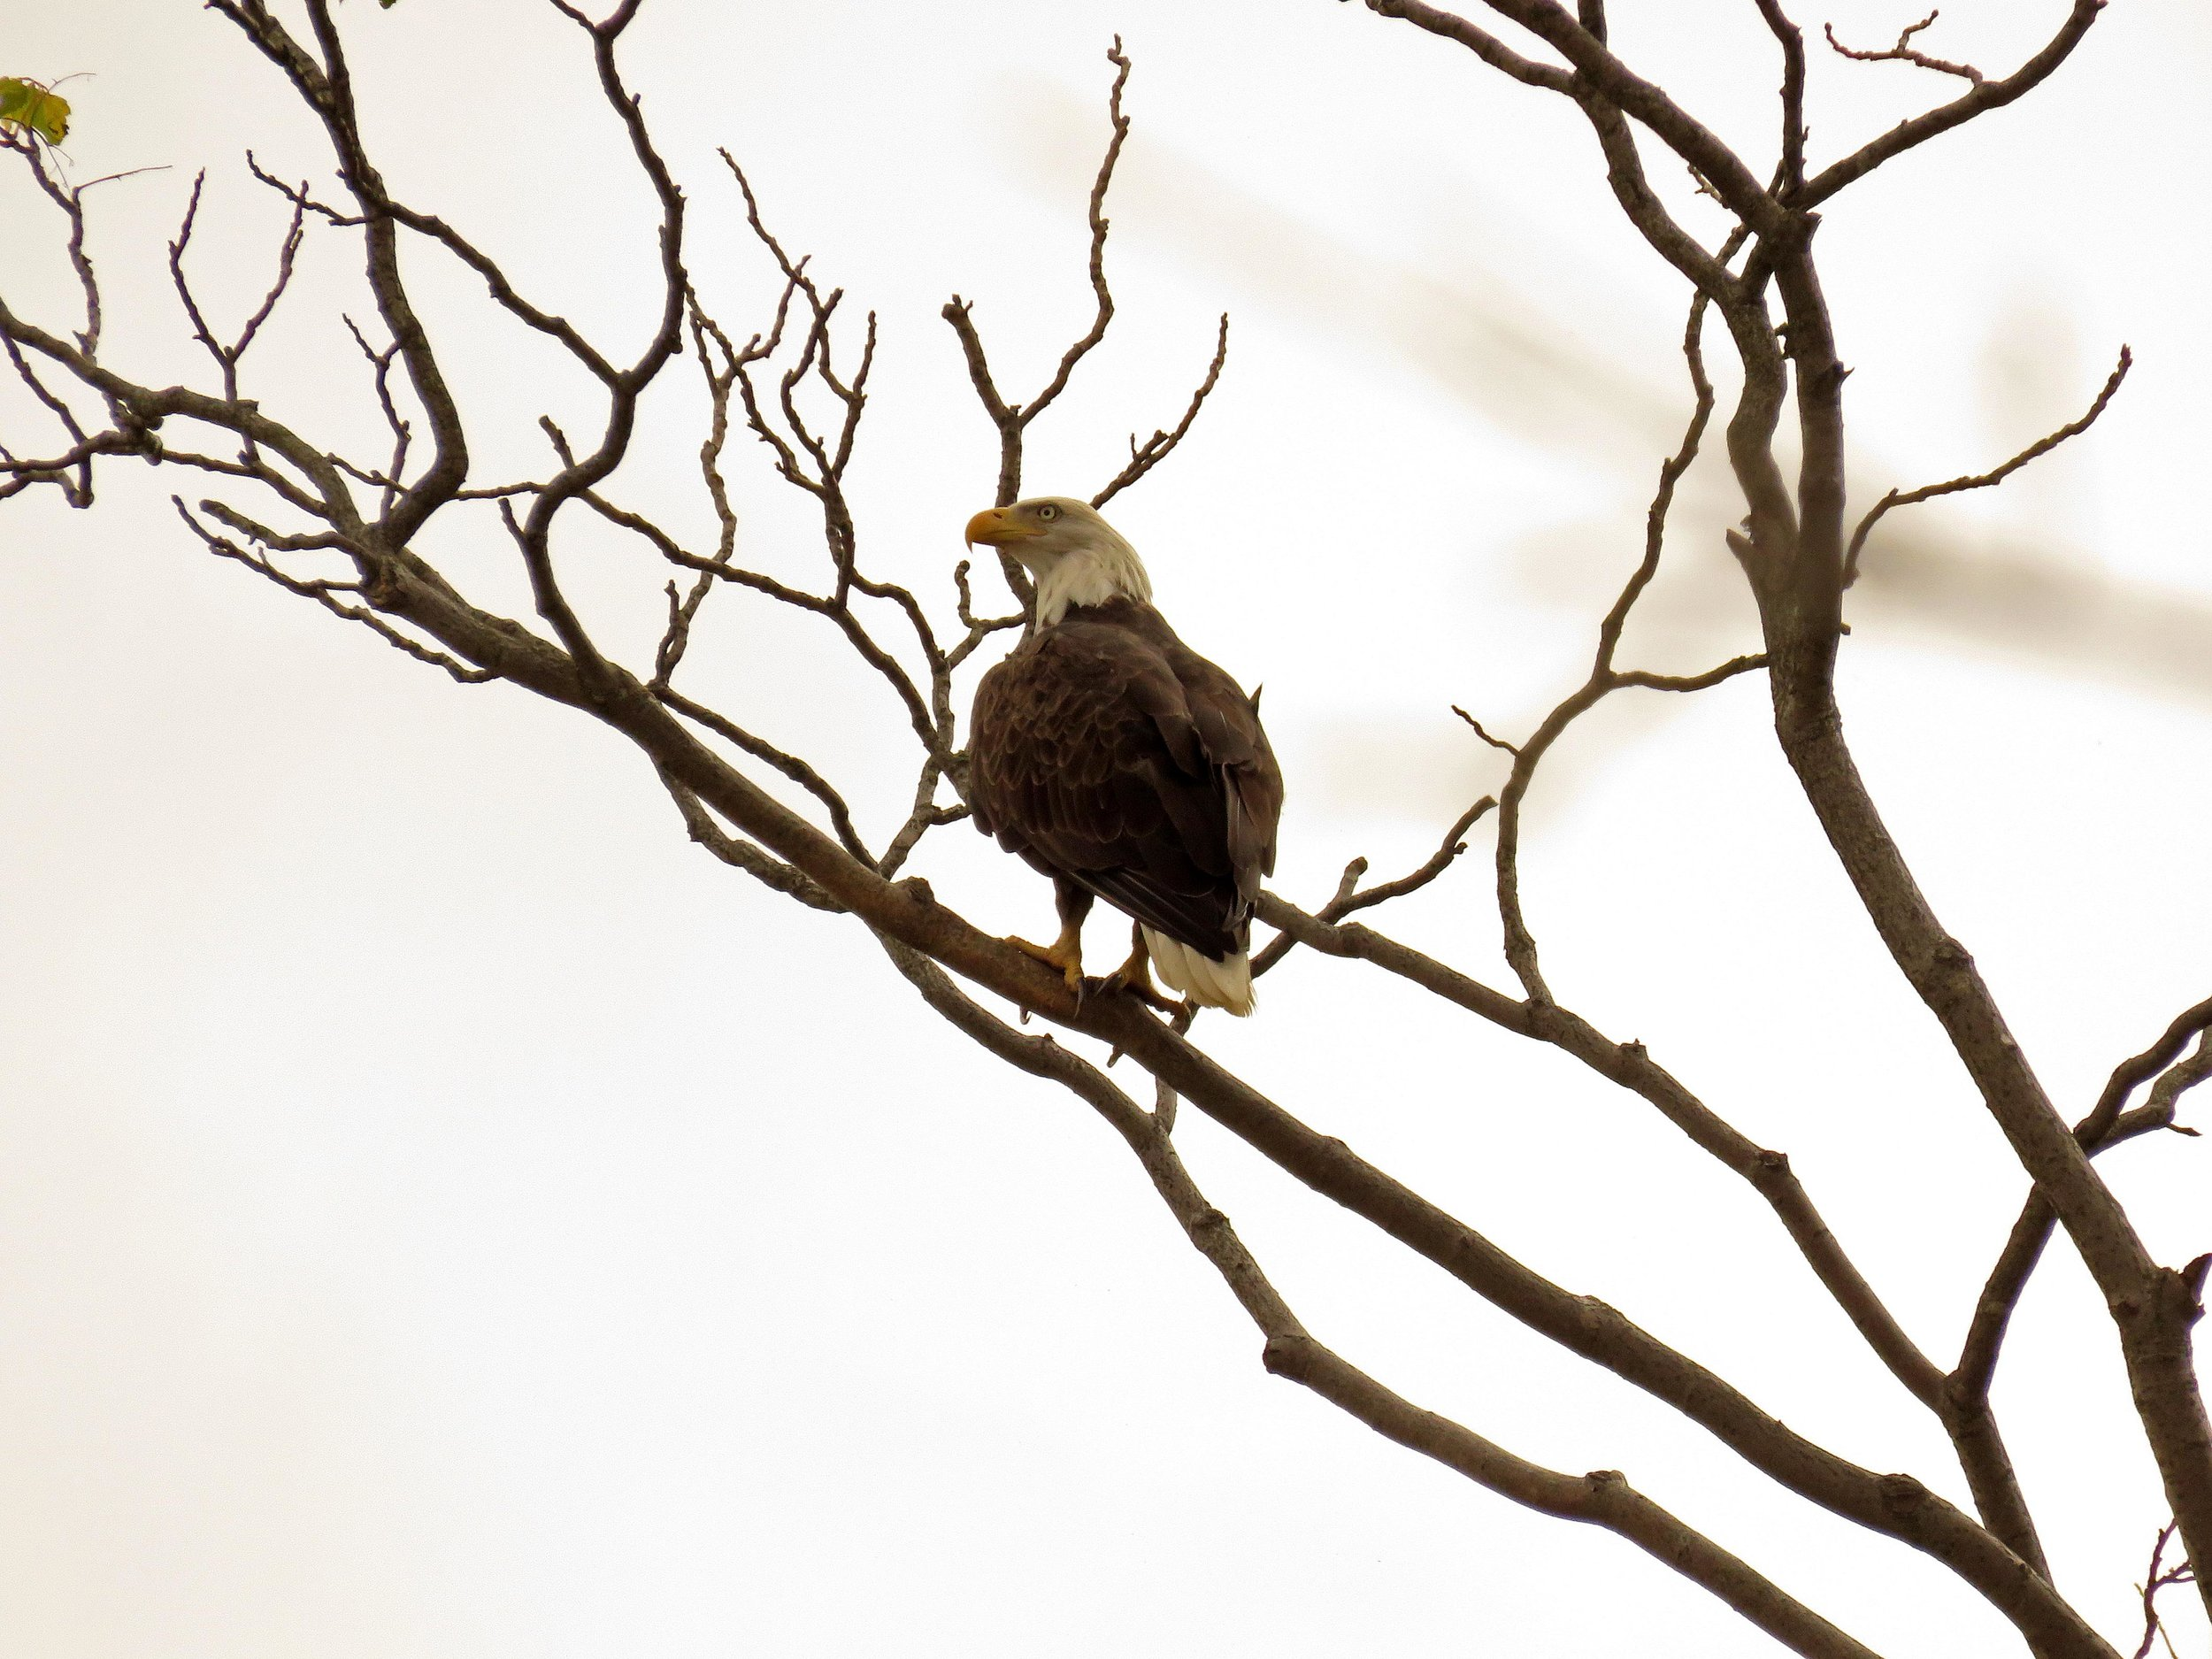 Adult bald eagle, Staten Island, Aug. 25, 2017